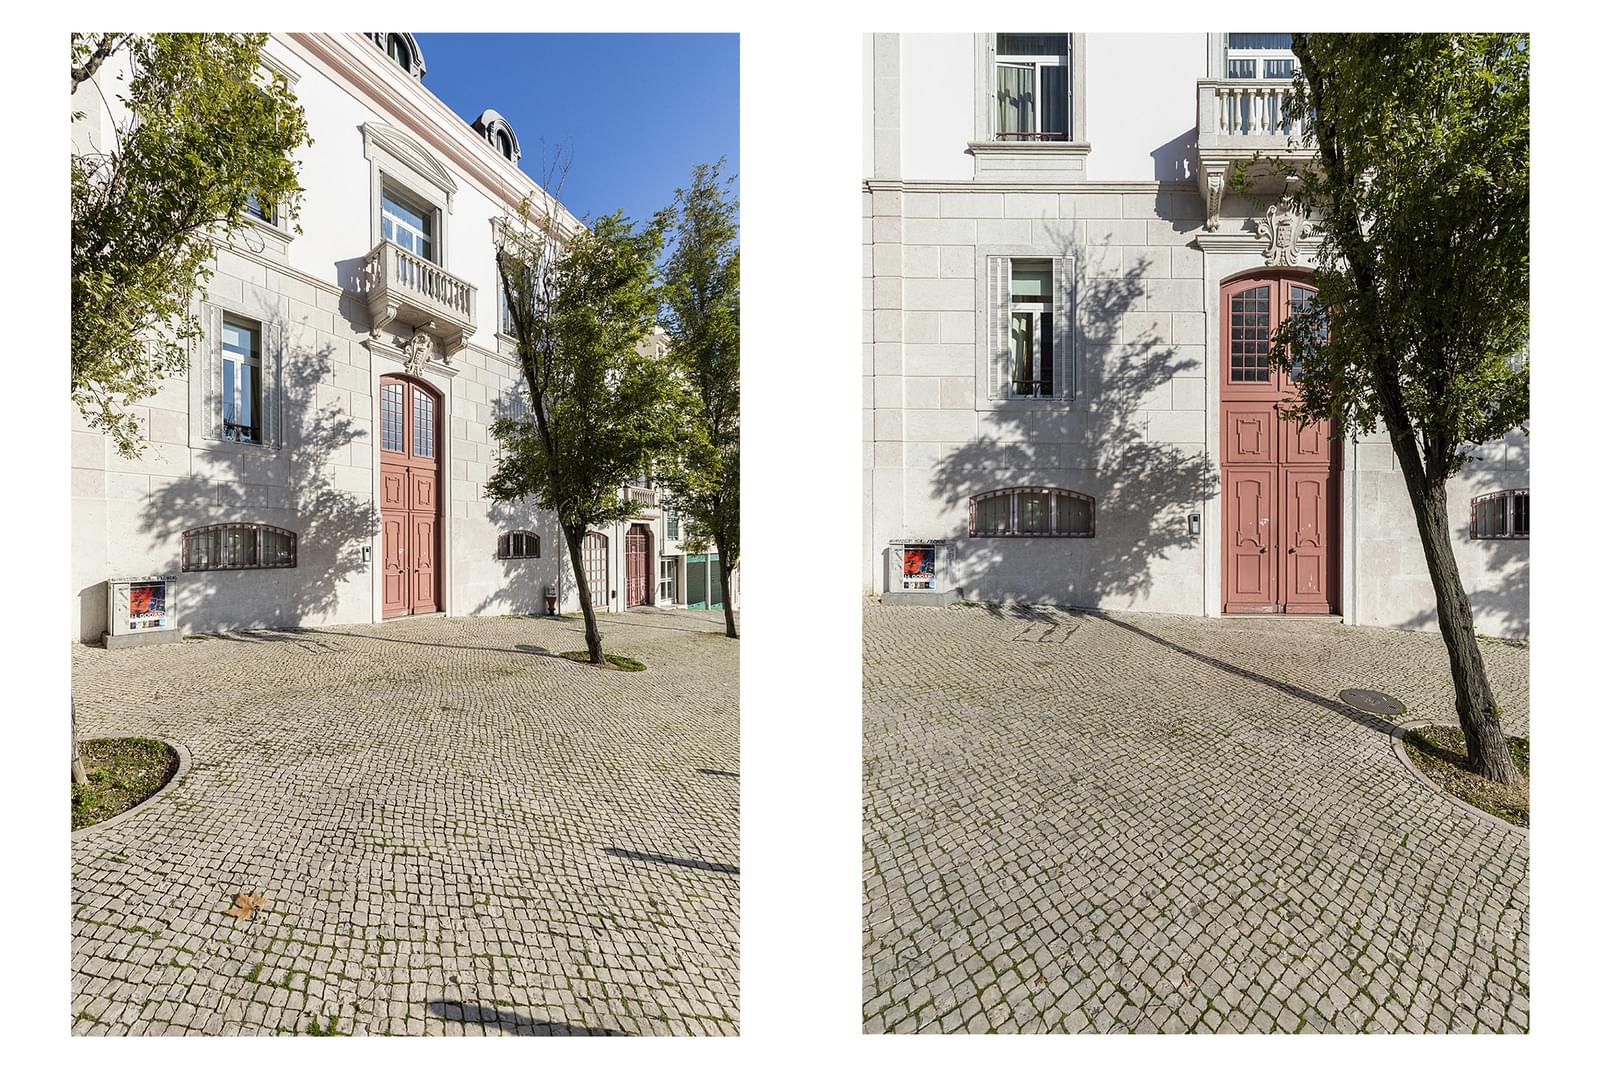 pf18843-apartamento-t3-2-lisboa-d1d383d0-3e88-48ec-812b-e57b6789a562